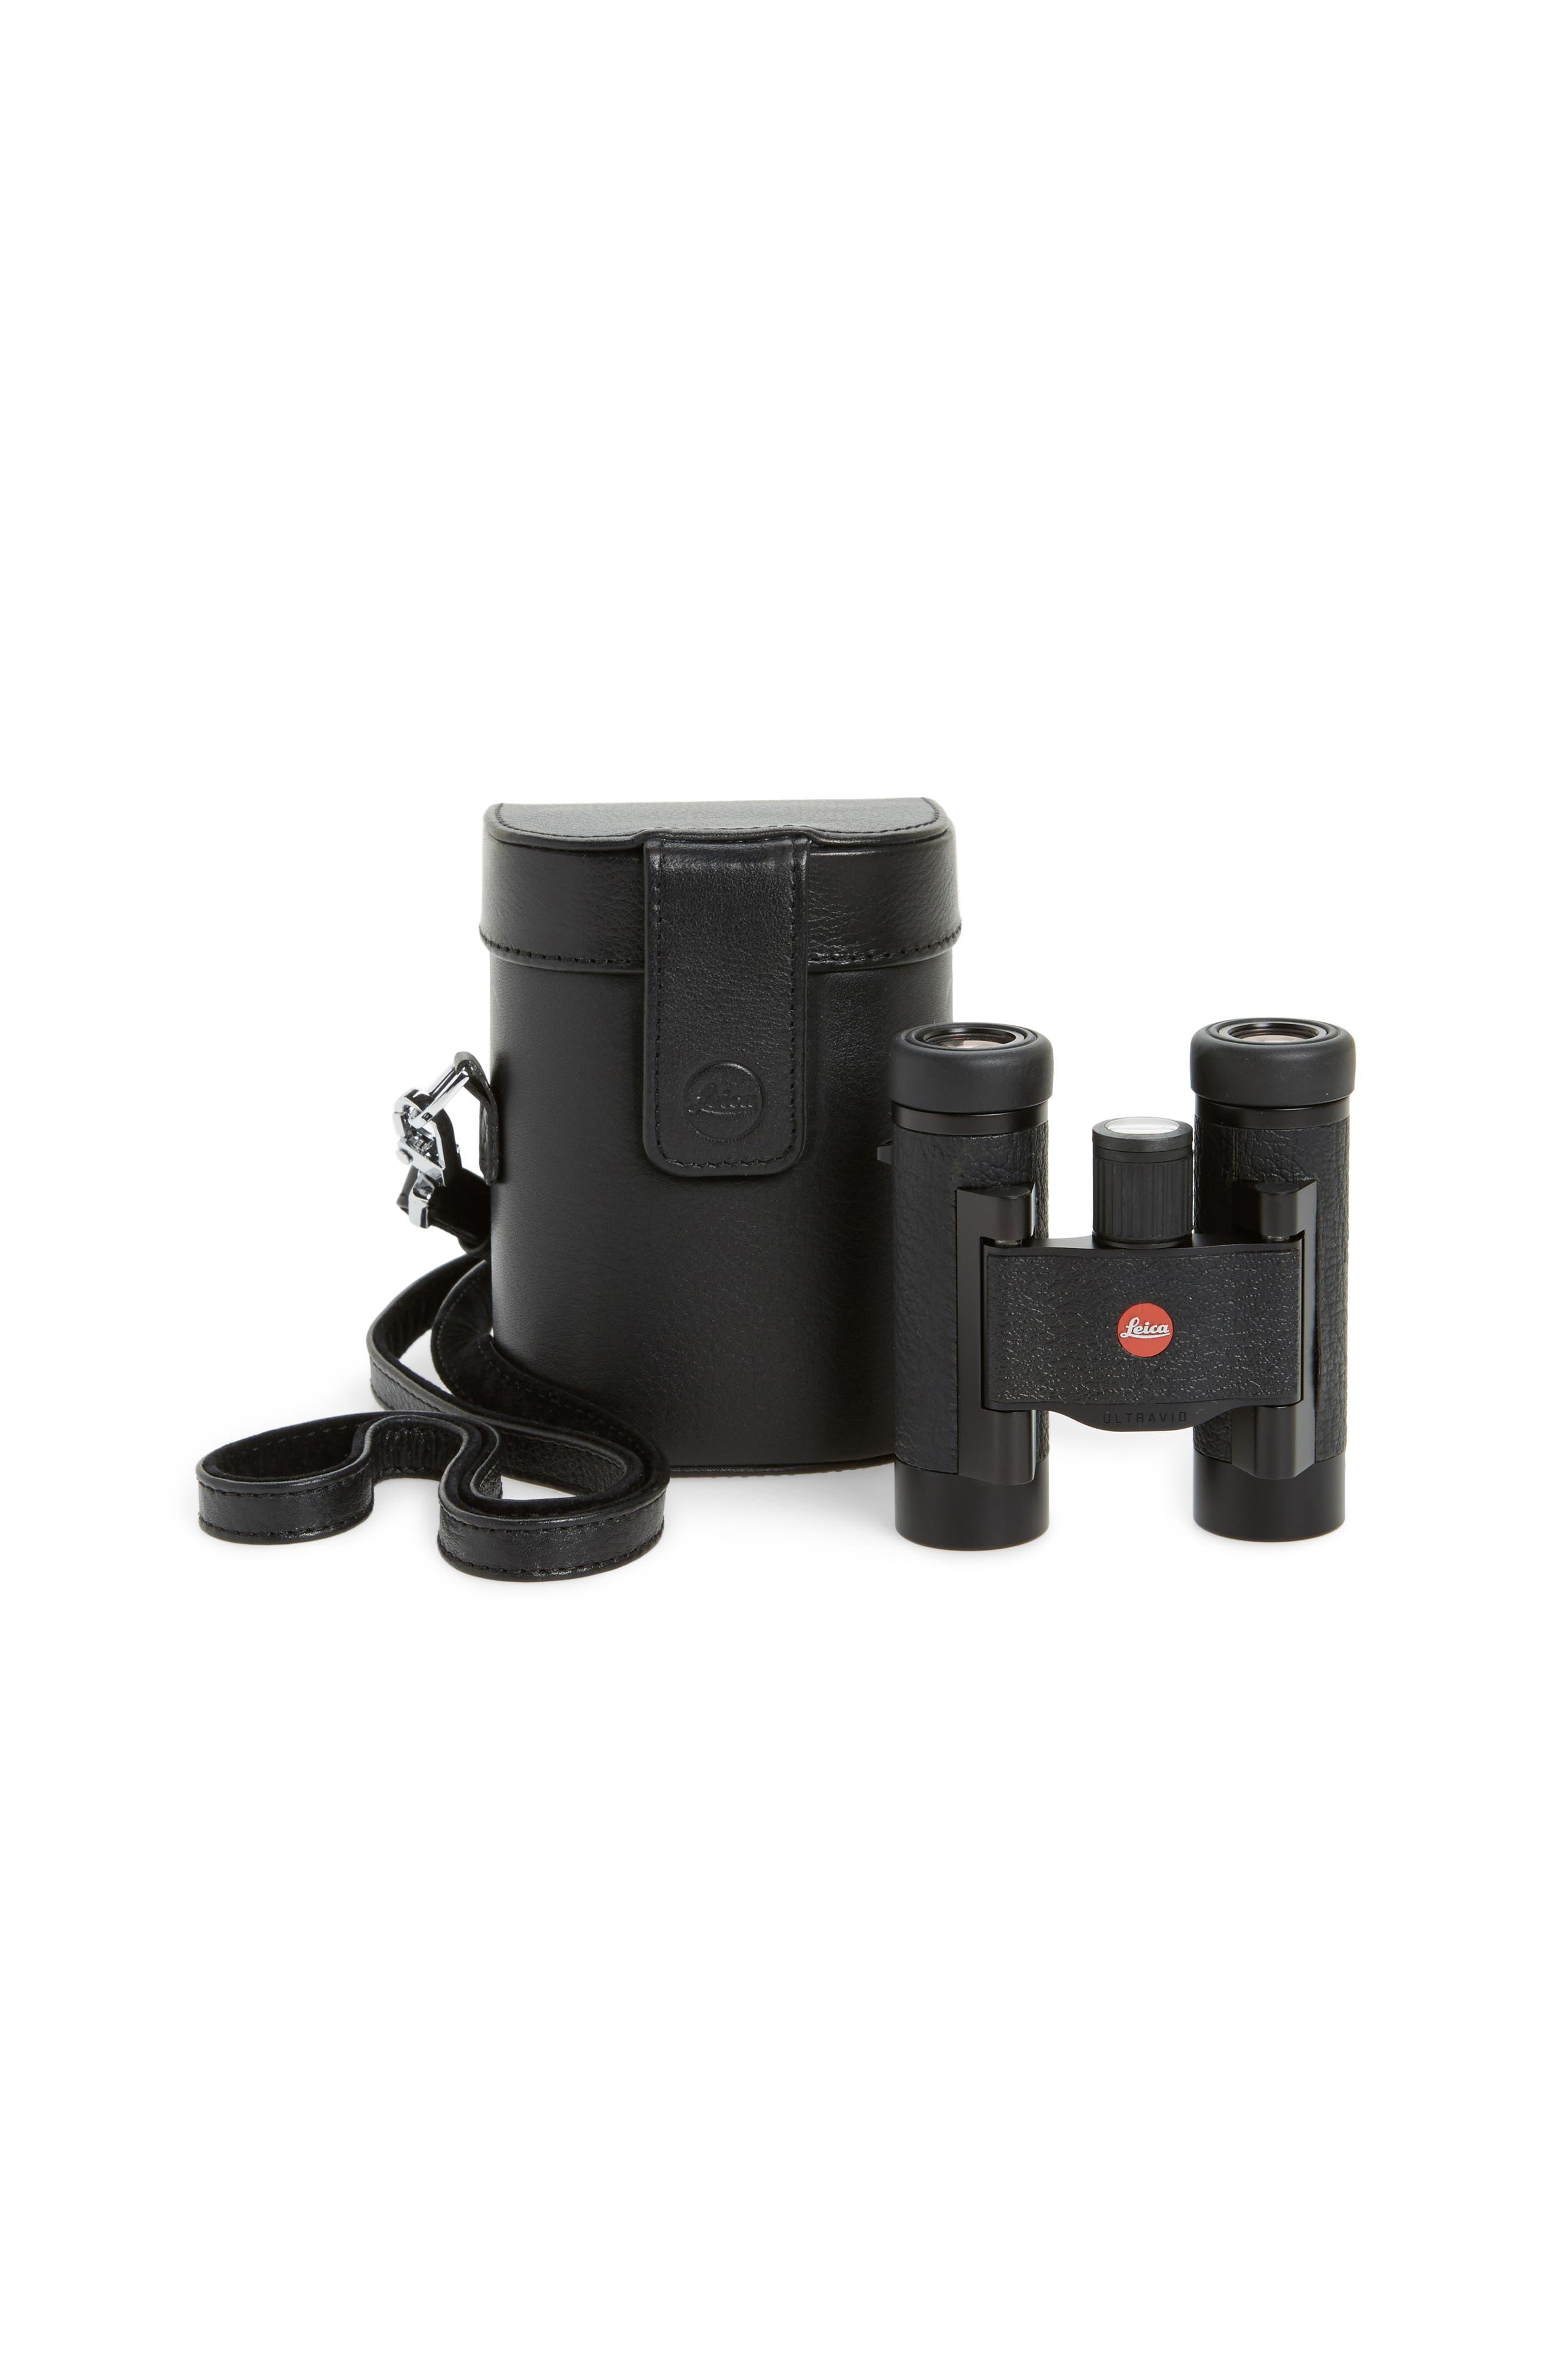 Ultravid Compact 8 x 20 Binocular,                             Main thumbnail 1, color,                             Black